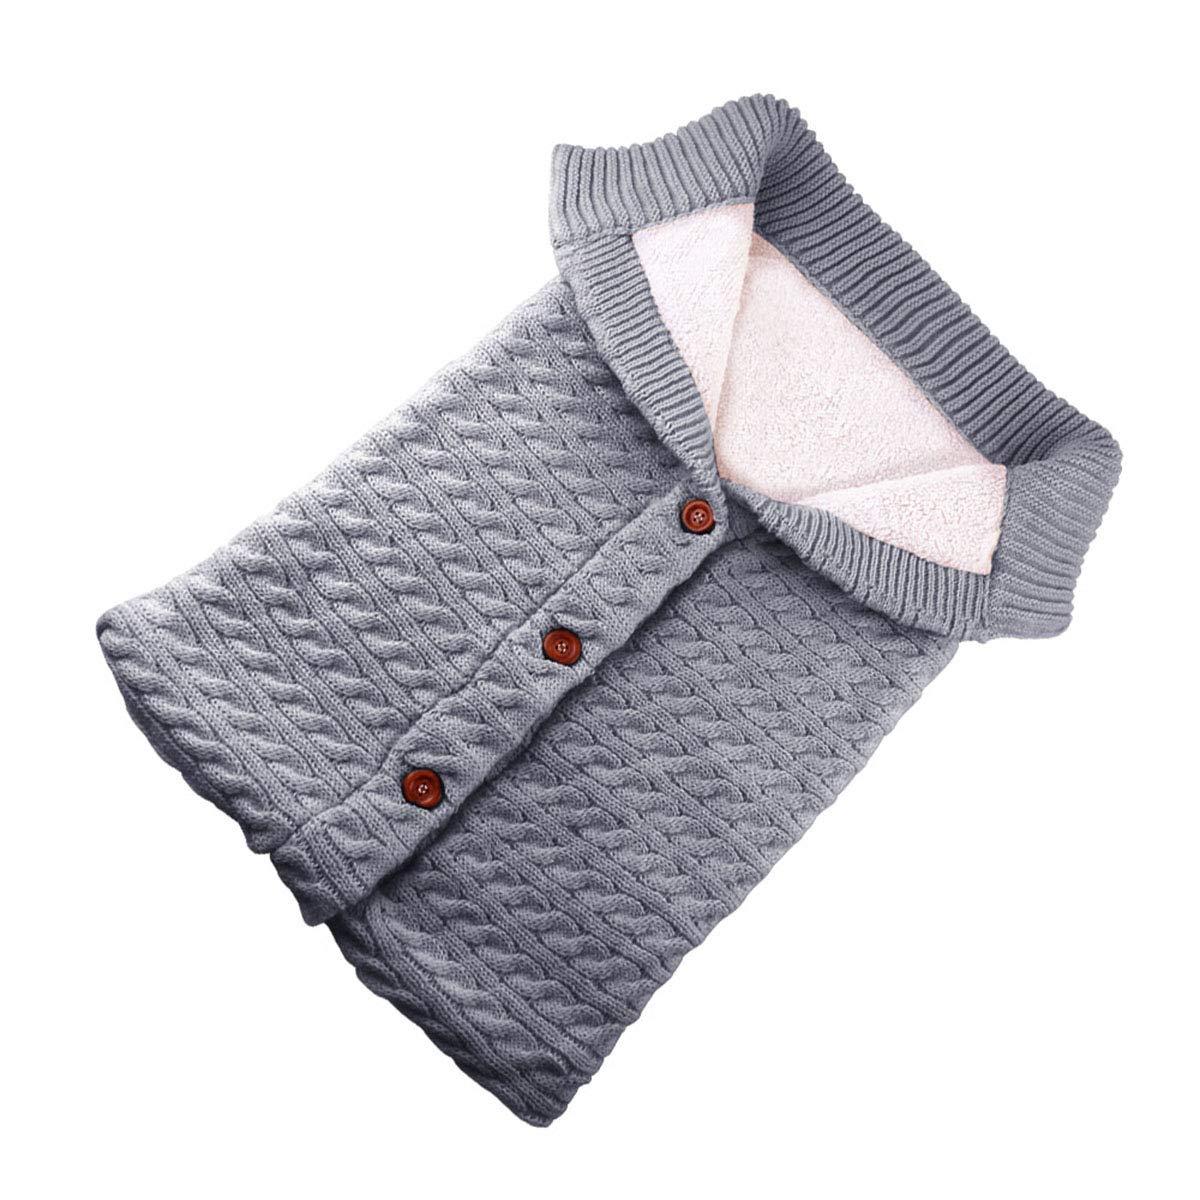 Newborn Baby Swaddle Blanket Stroller Wrap Plus Velvet Baby Kids Toddler Thick Knit Soft Warm Fleece Blanket Swaddle Sleeping Bag Sleep Sack Stroller for Boys and Girls Grey